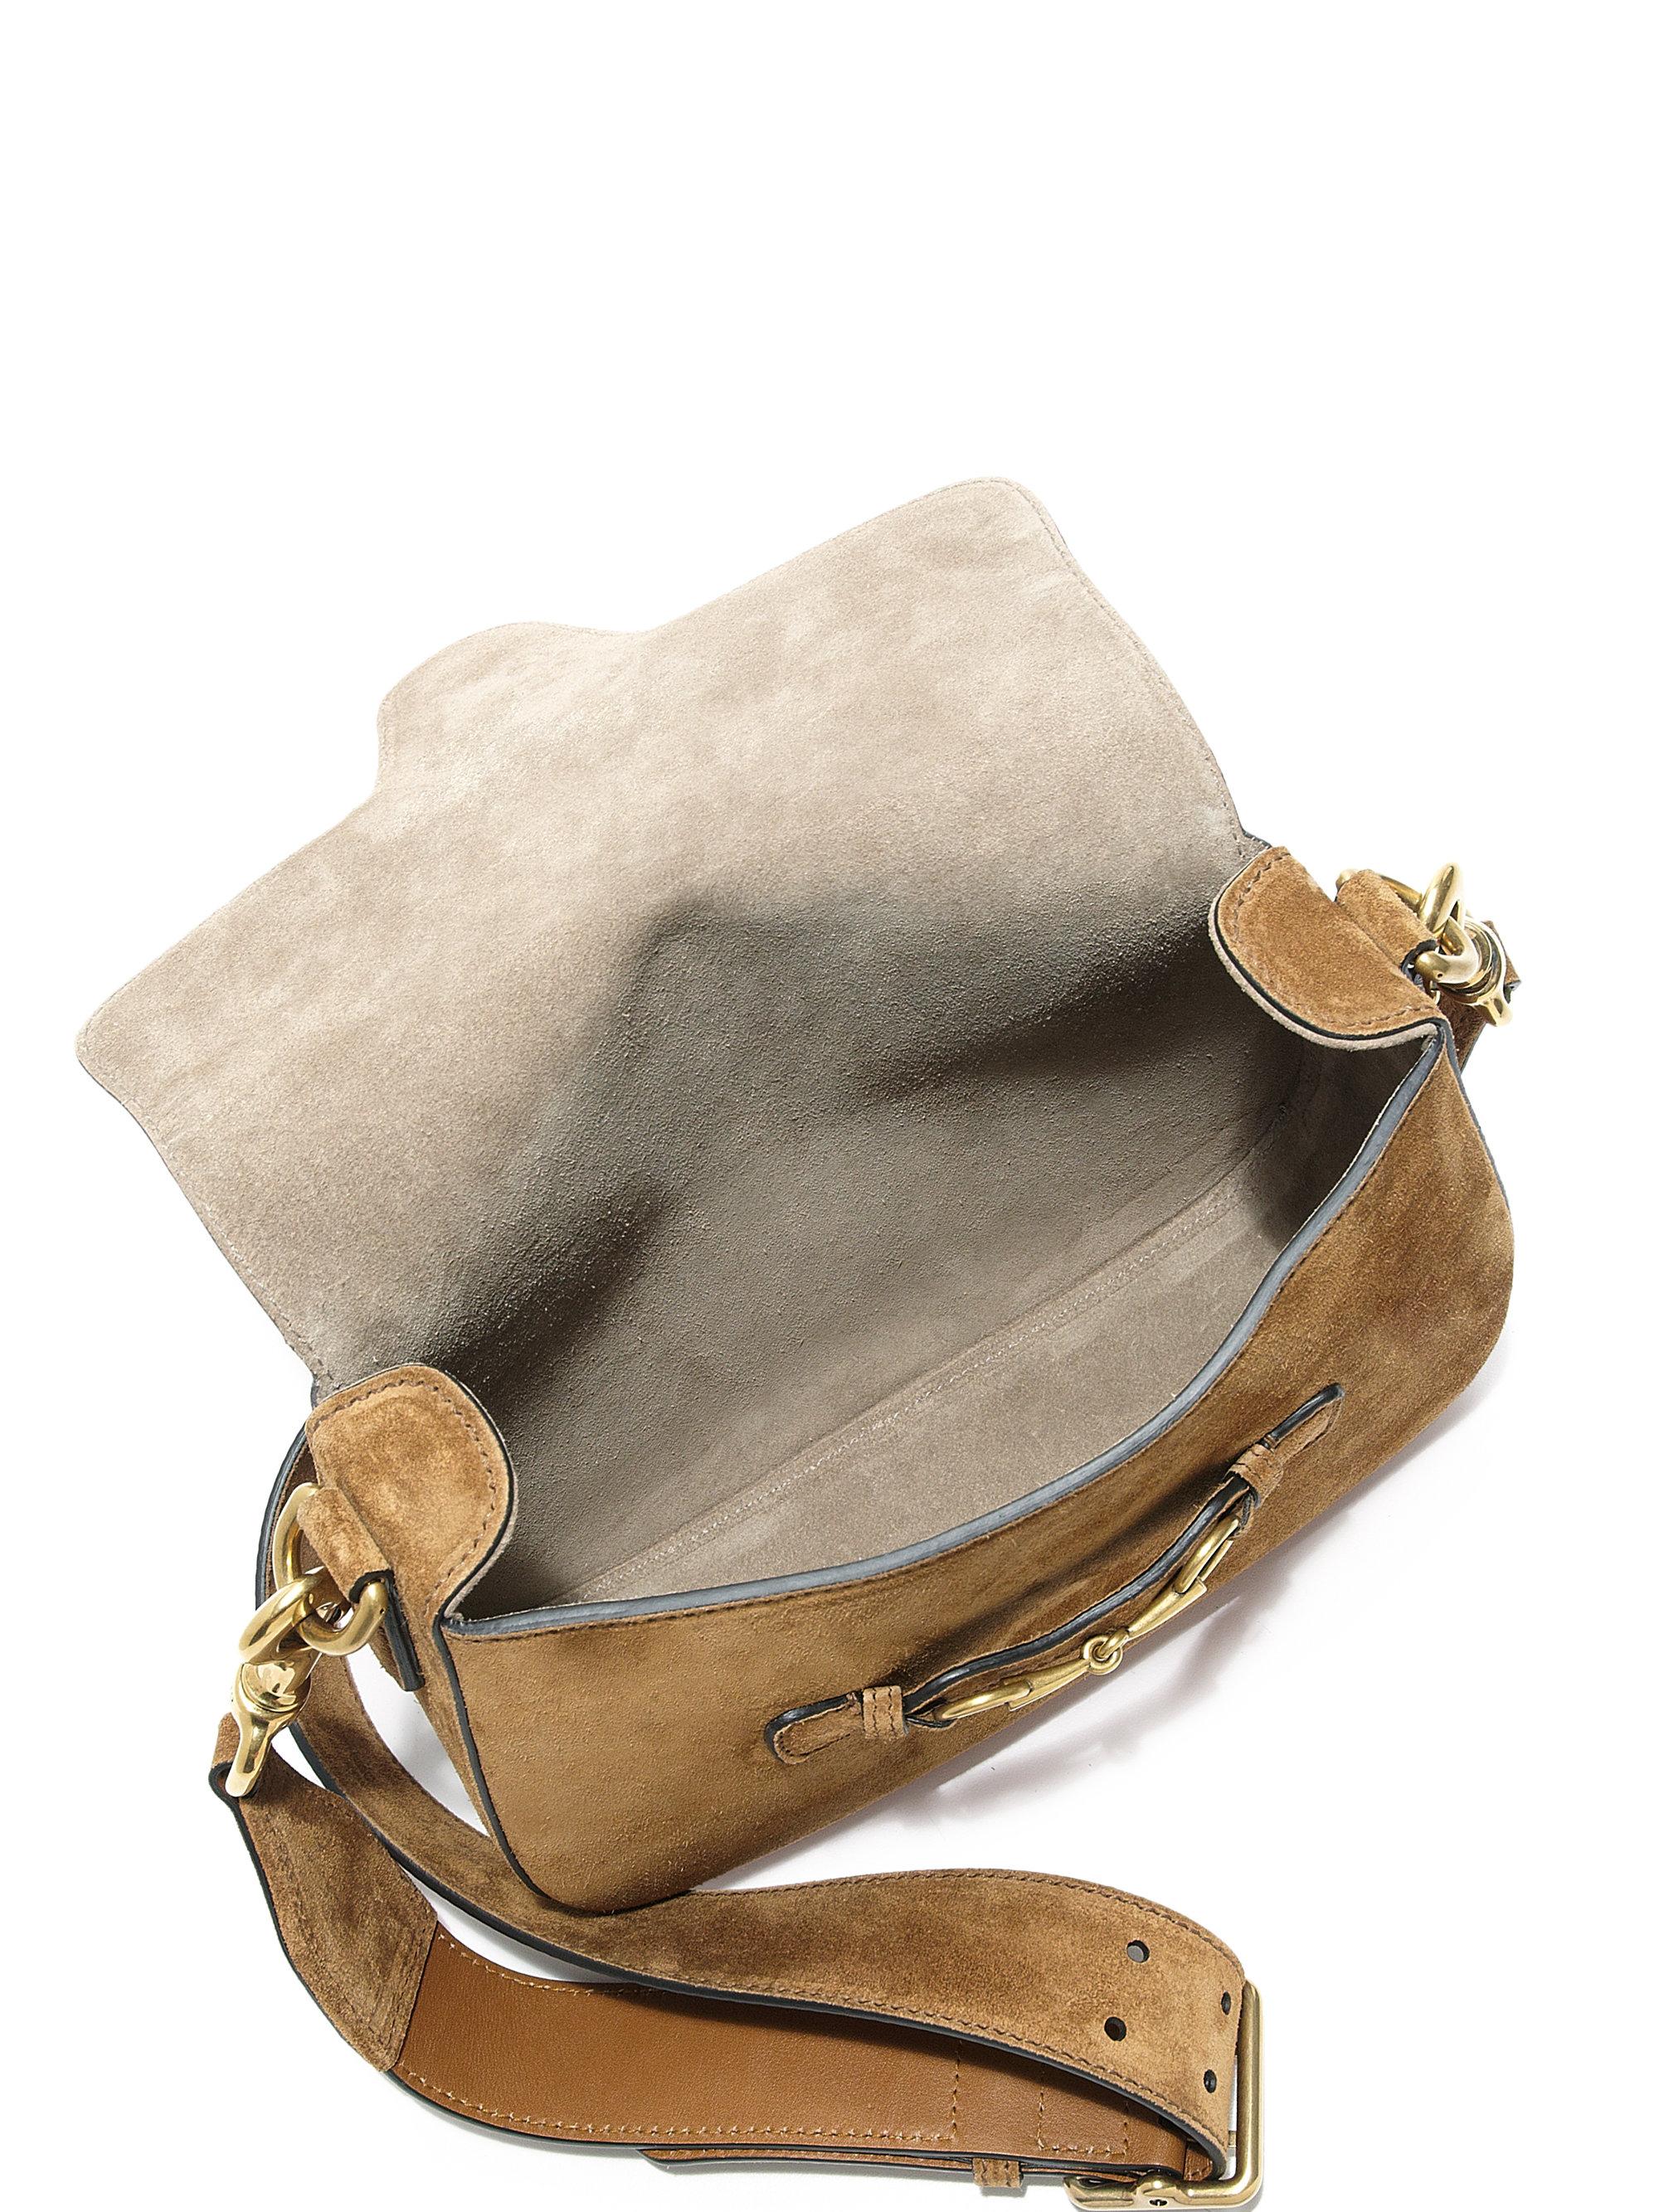 a2f71a44fecb1 Lyst - Gucci Lady Web Suede Shoulder Bag in Brown